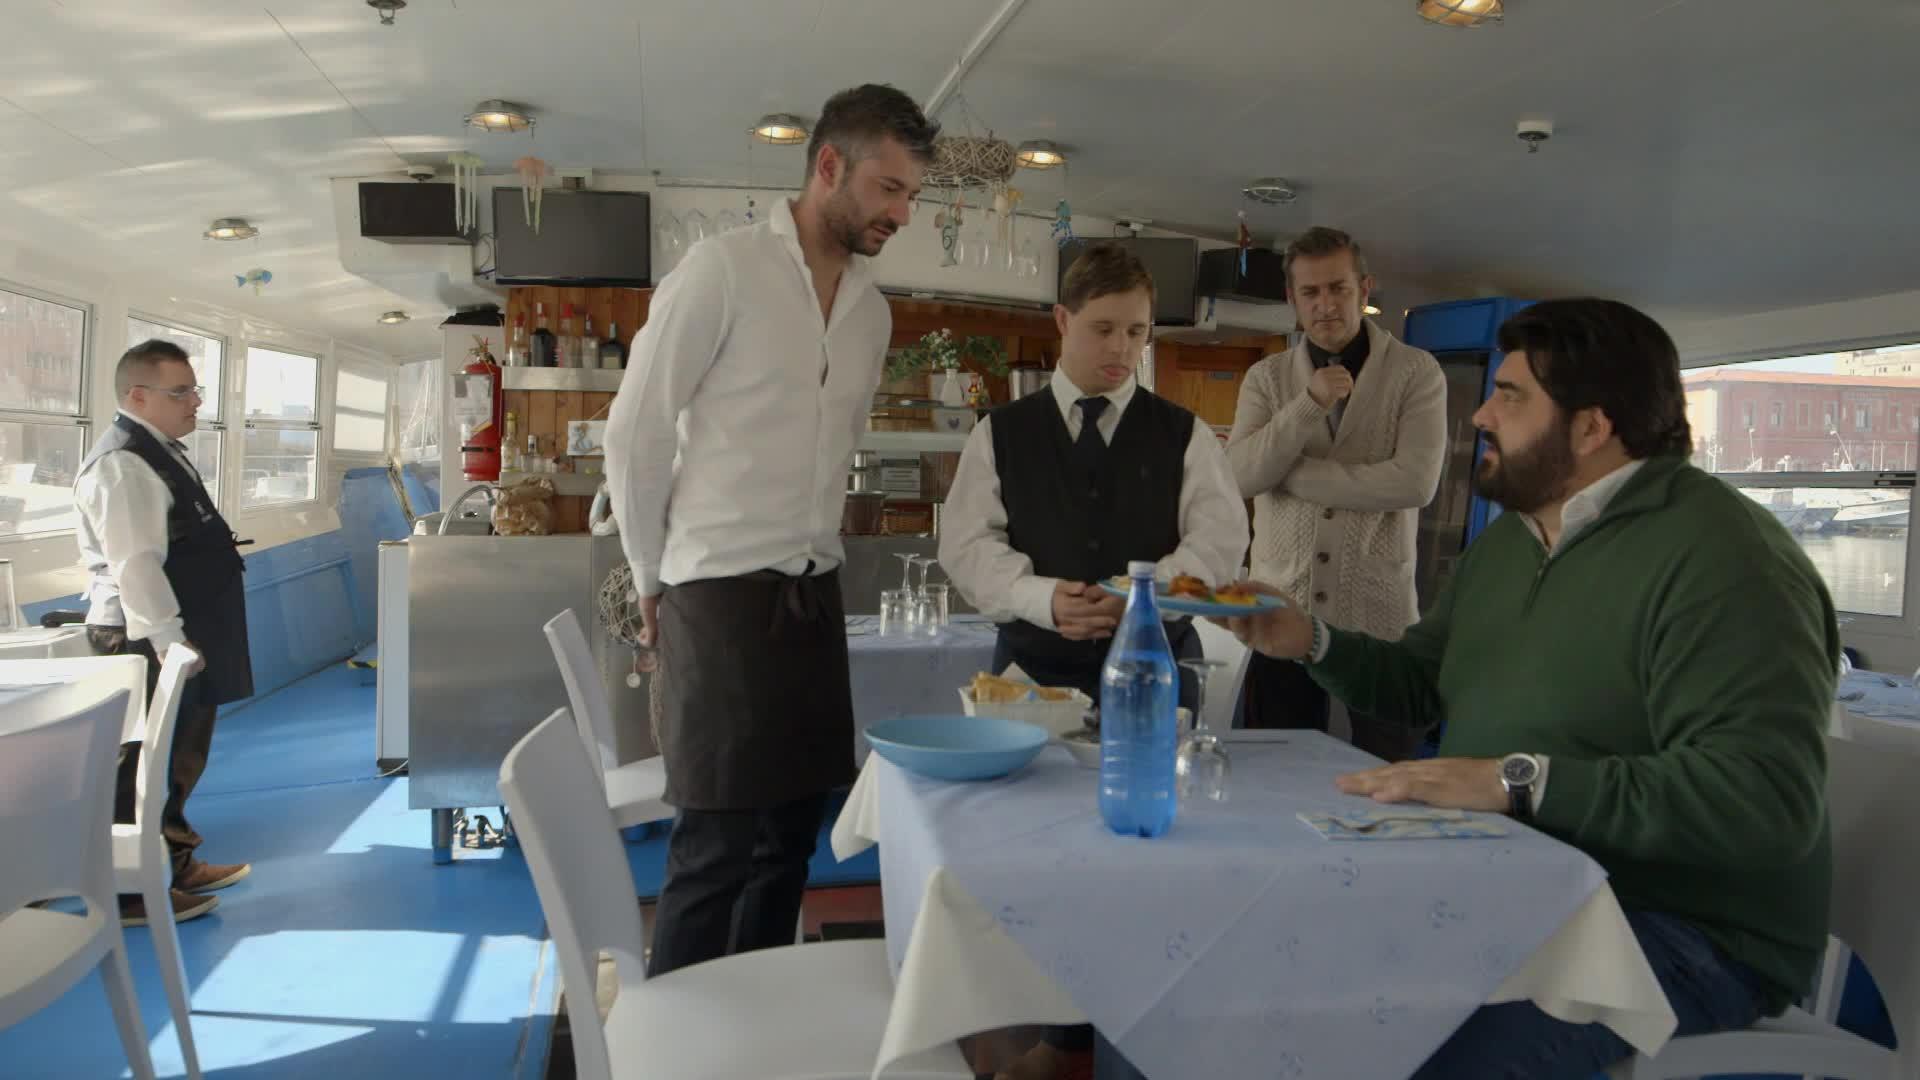 Cucine da incubo italia antonino cannavacciuolo a livorno dplay - Cucine da incubo cannavacciuolo ...